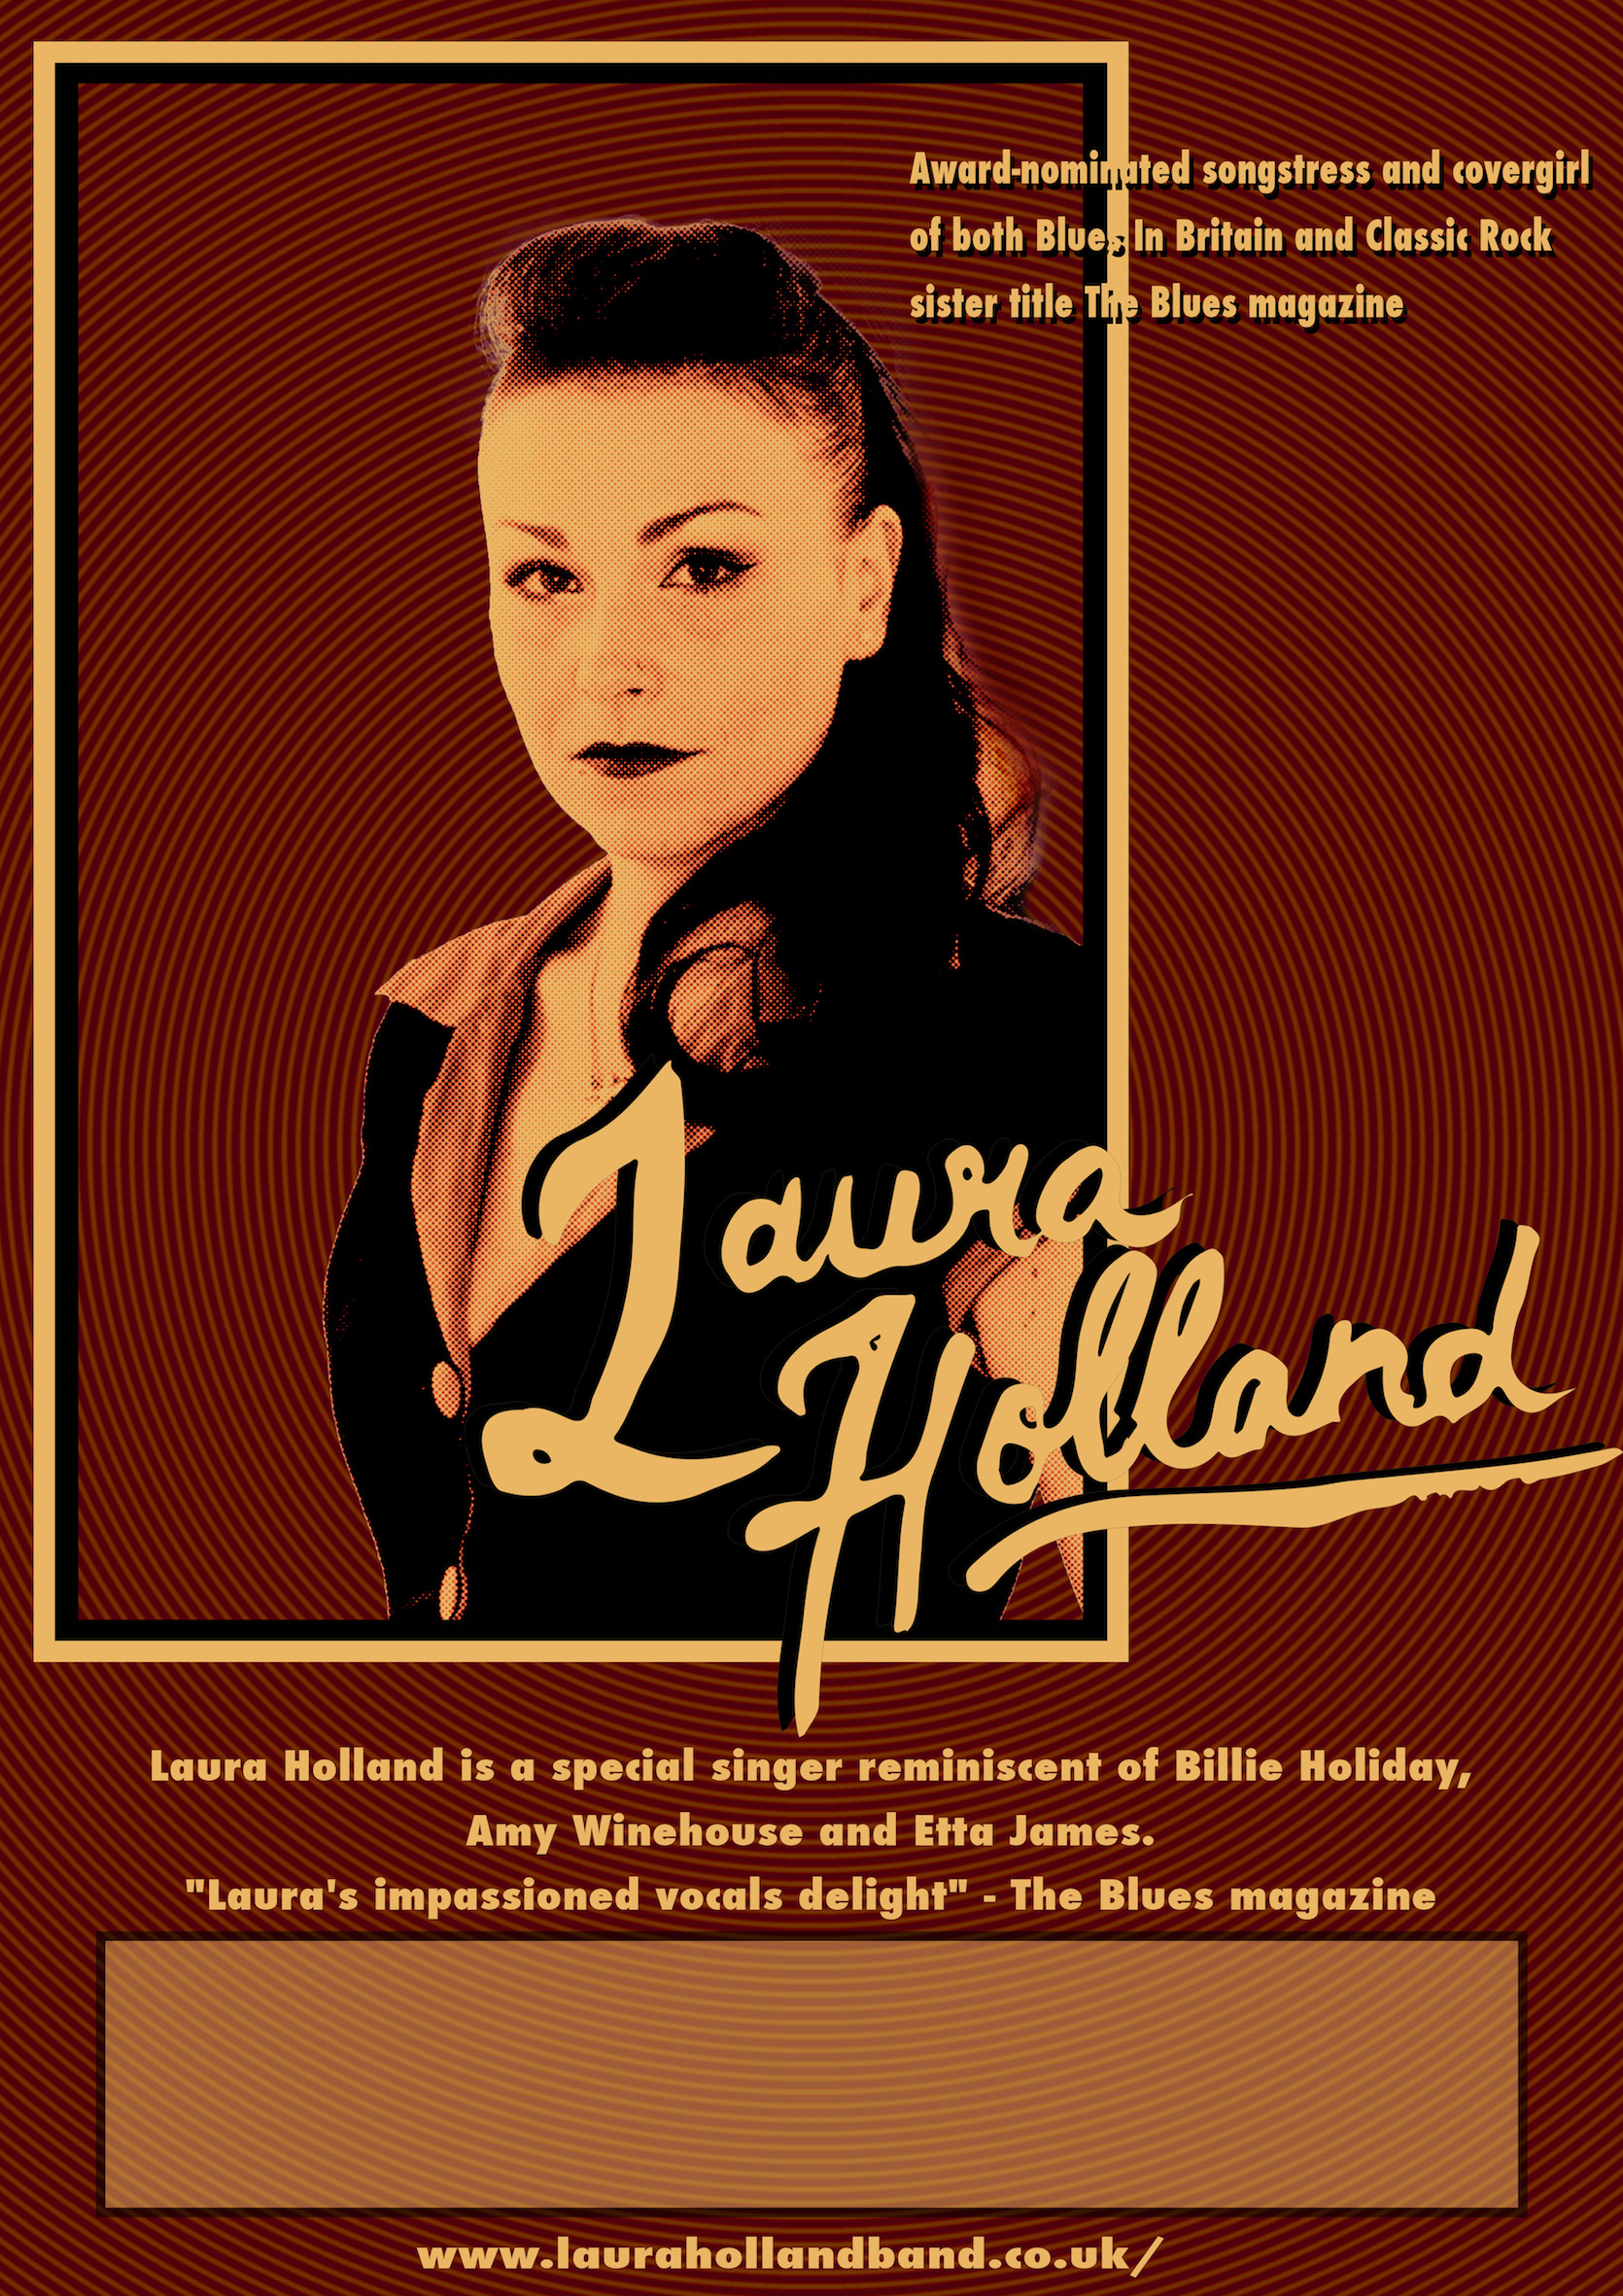 LauraHolland_GigPoster (1).jpg